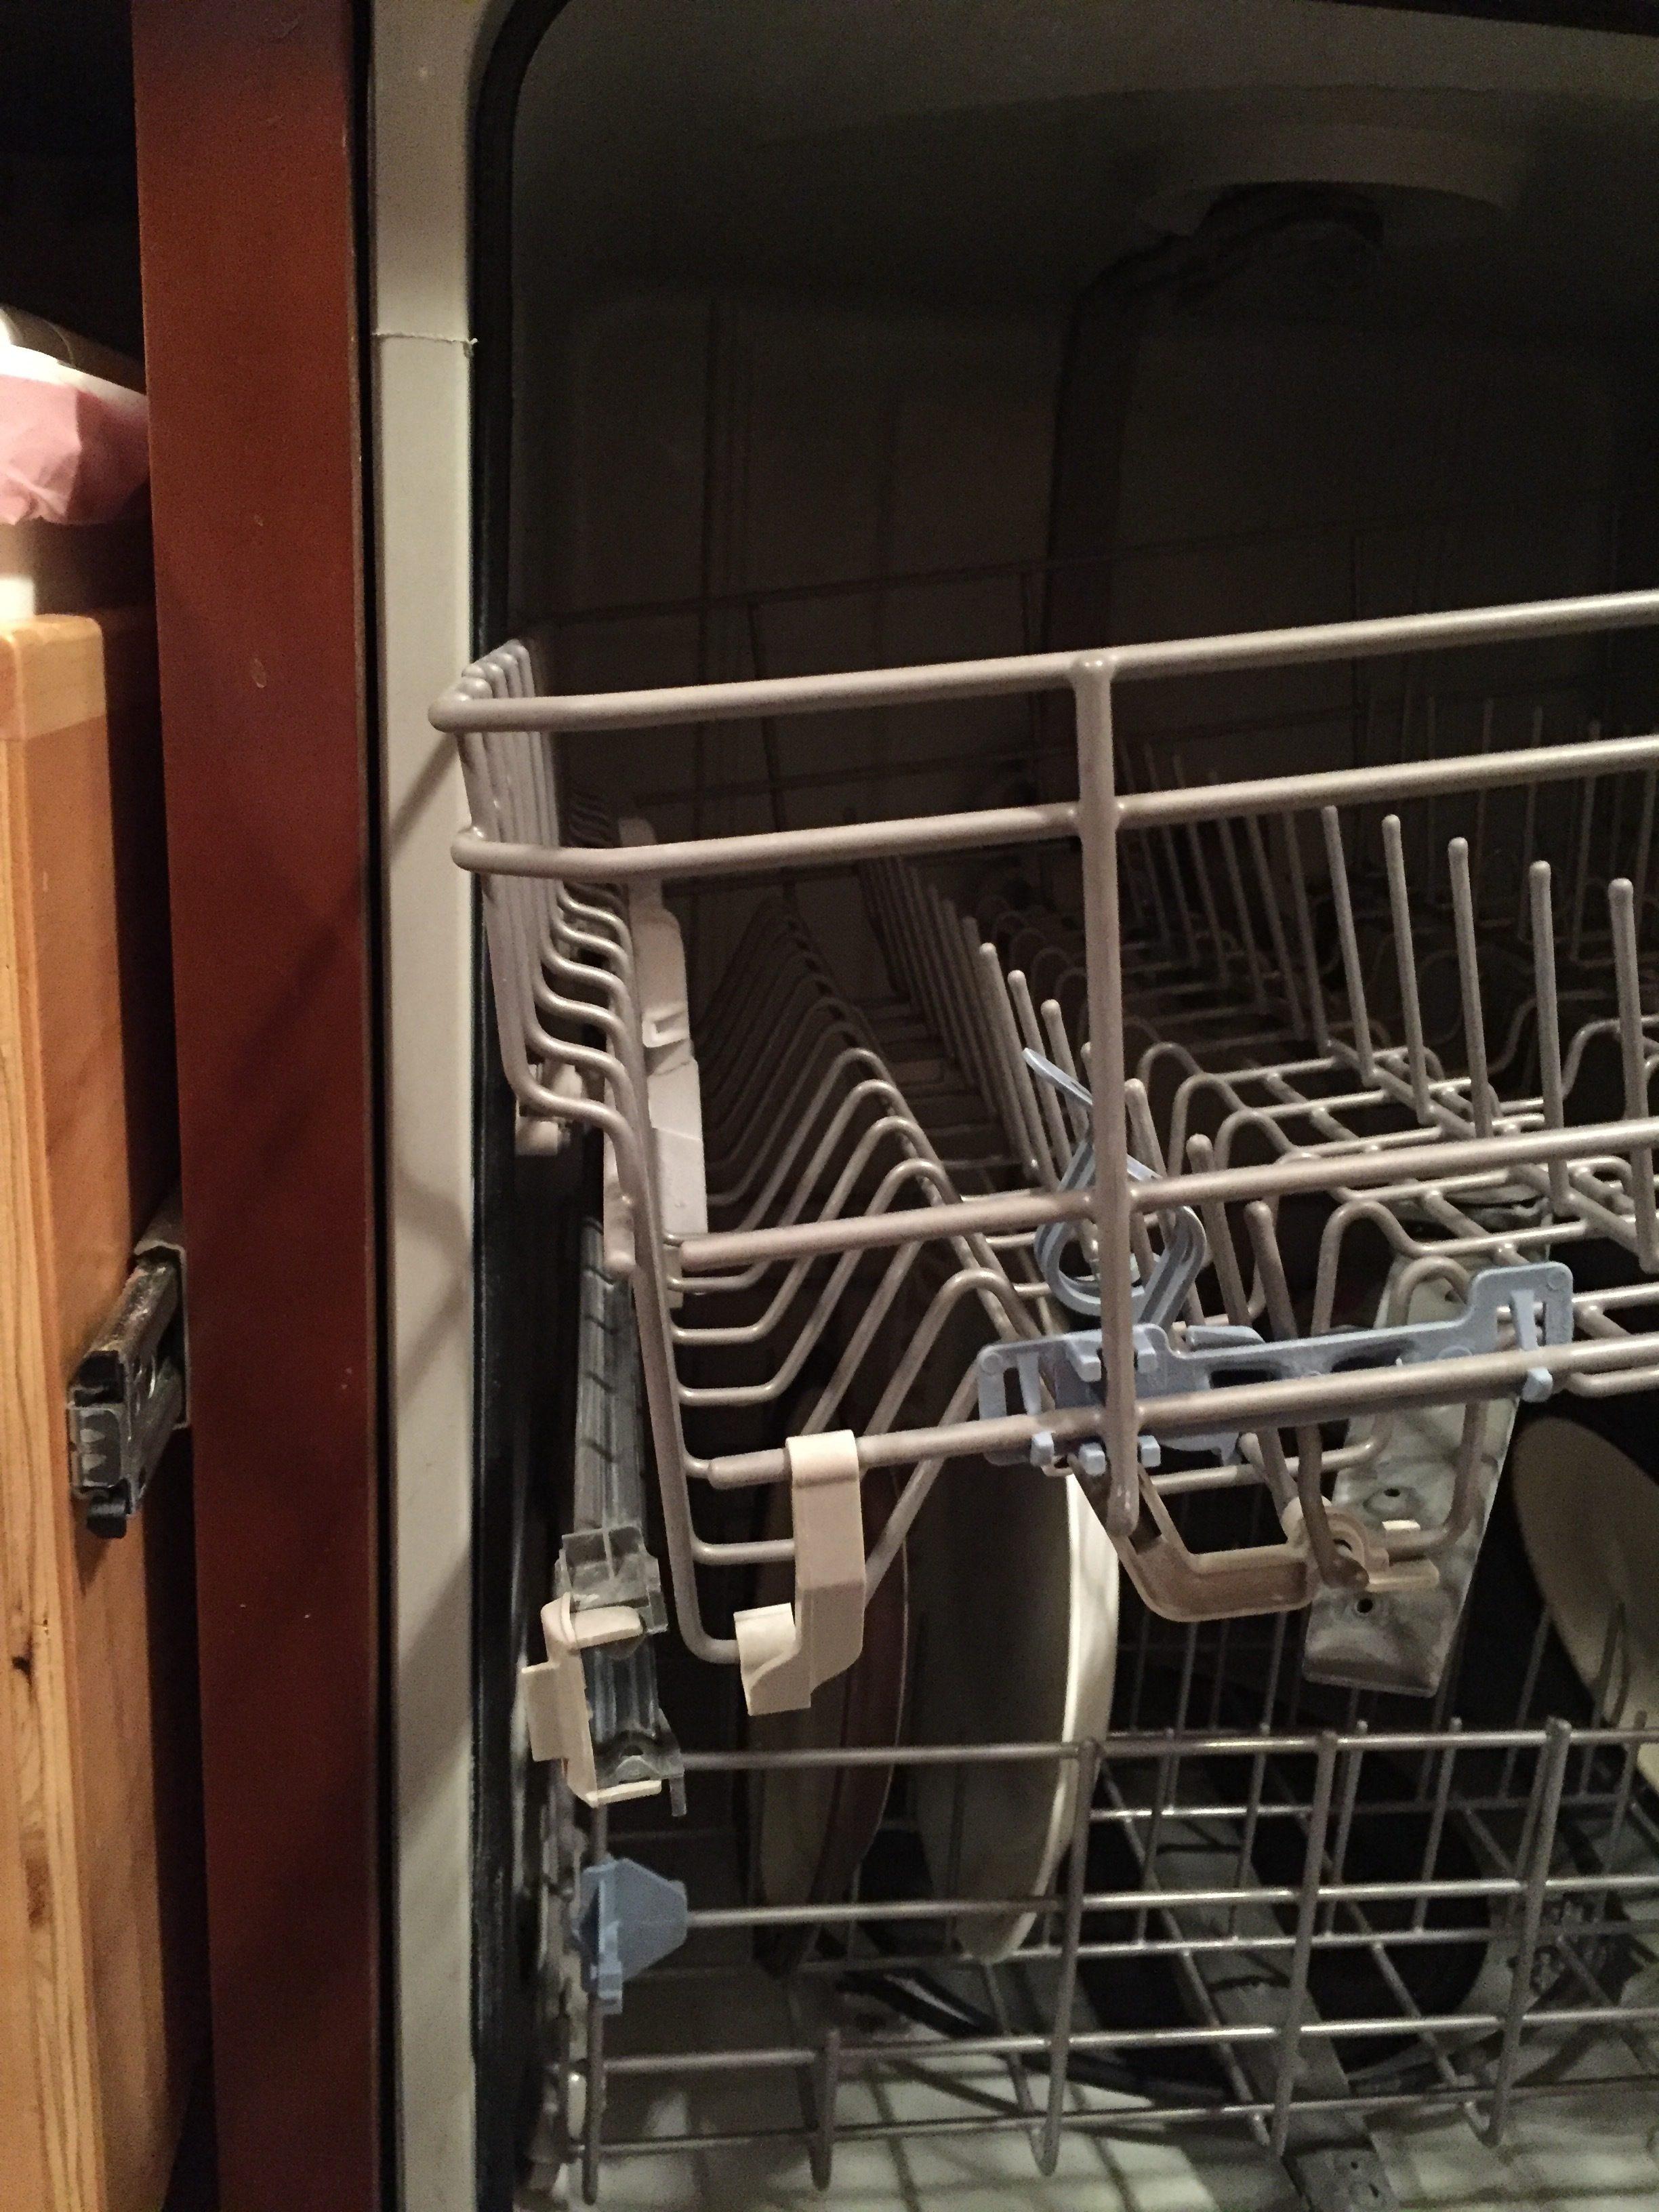 Kitchenaid Dishwasher Rack Parts